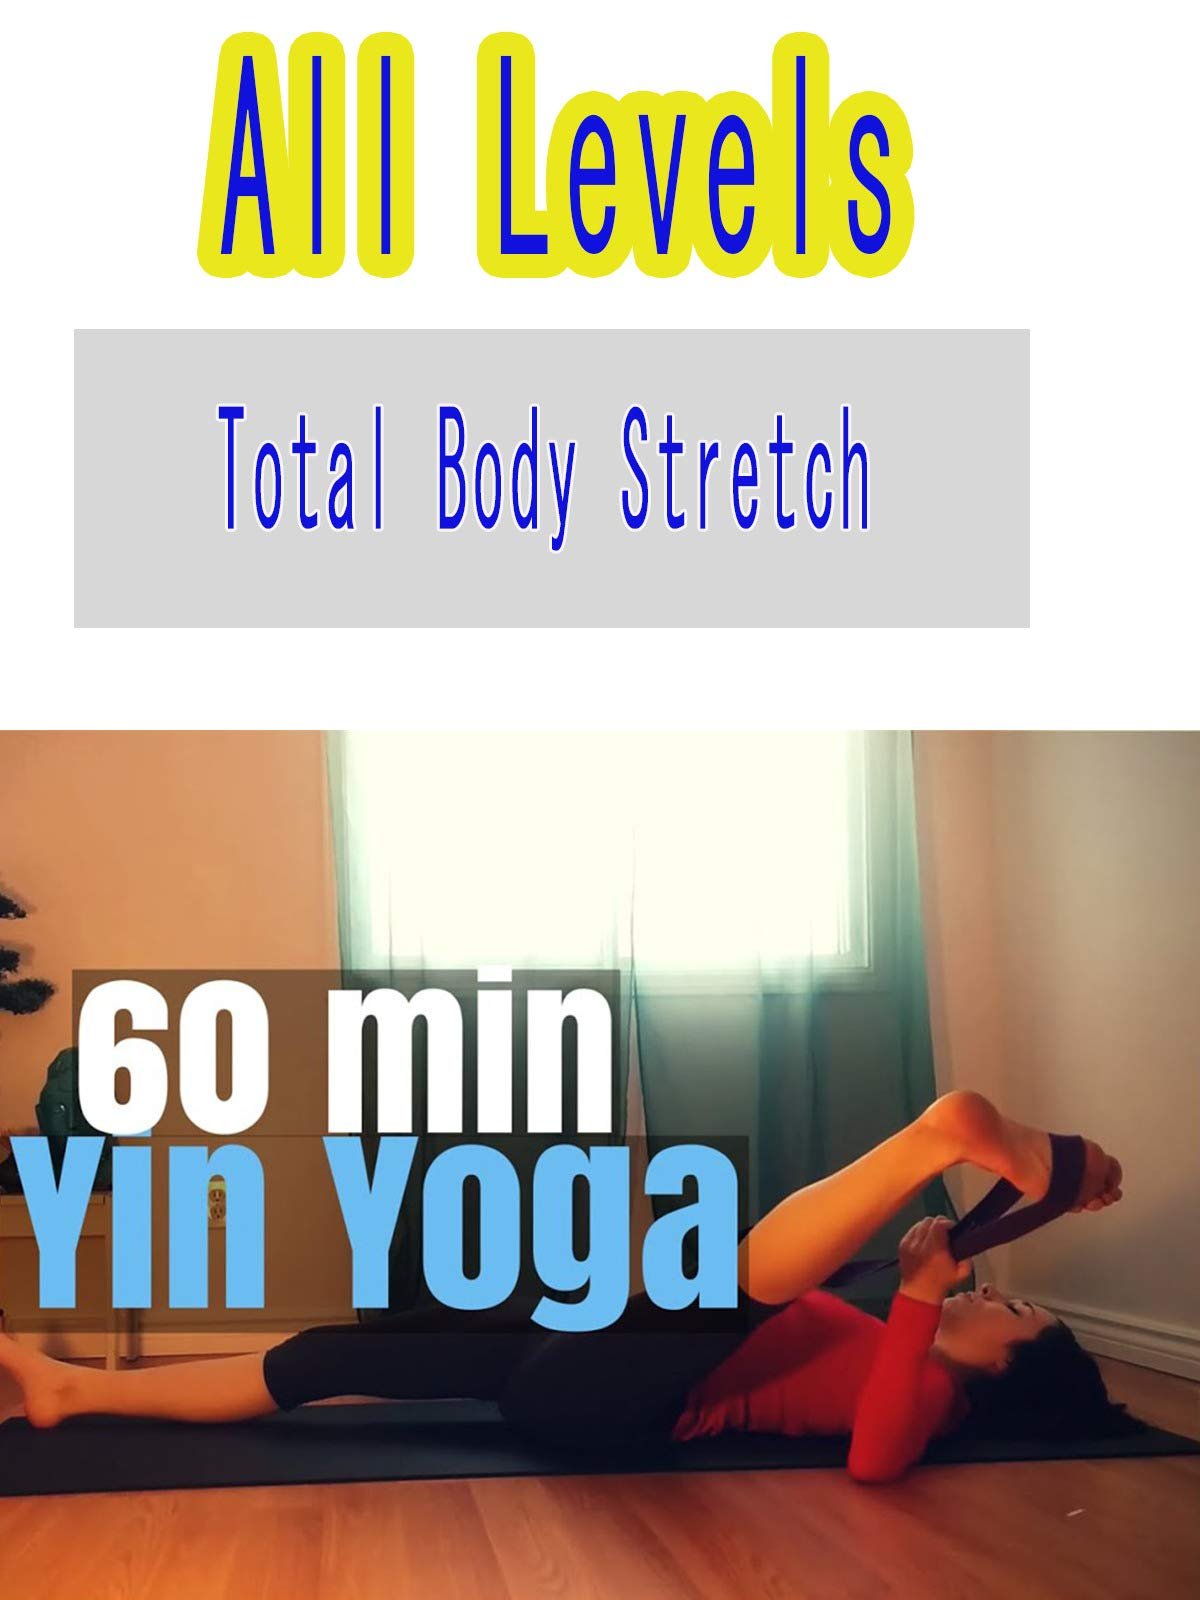 60 minute Yin Yoga Full Class - All Levels Total Body Stretch